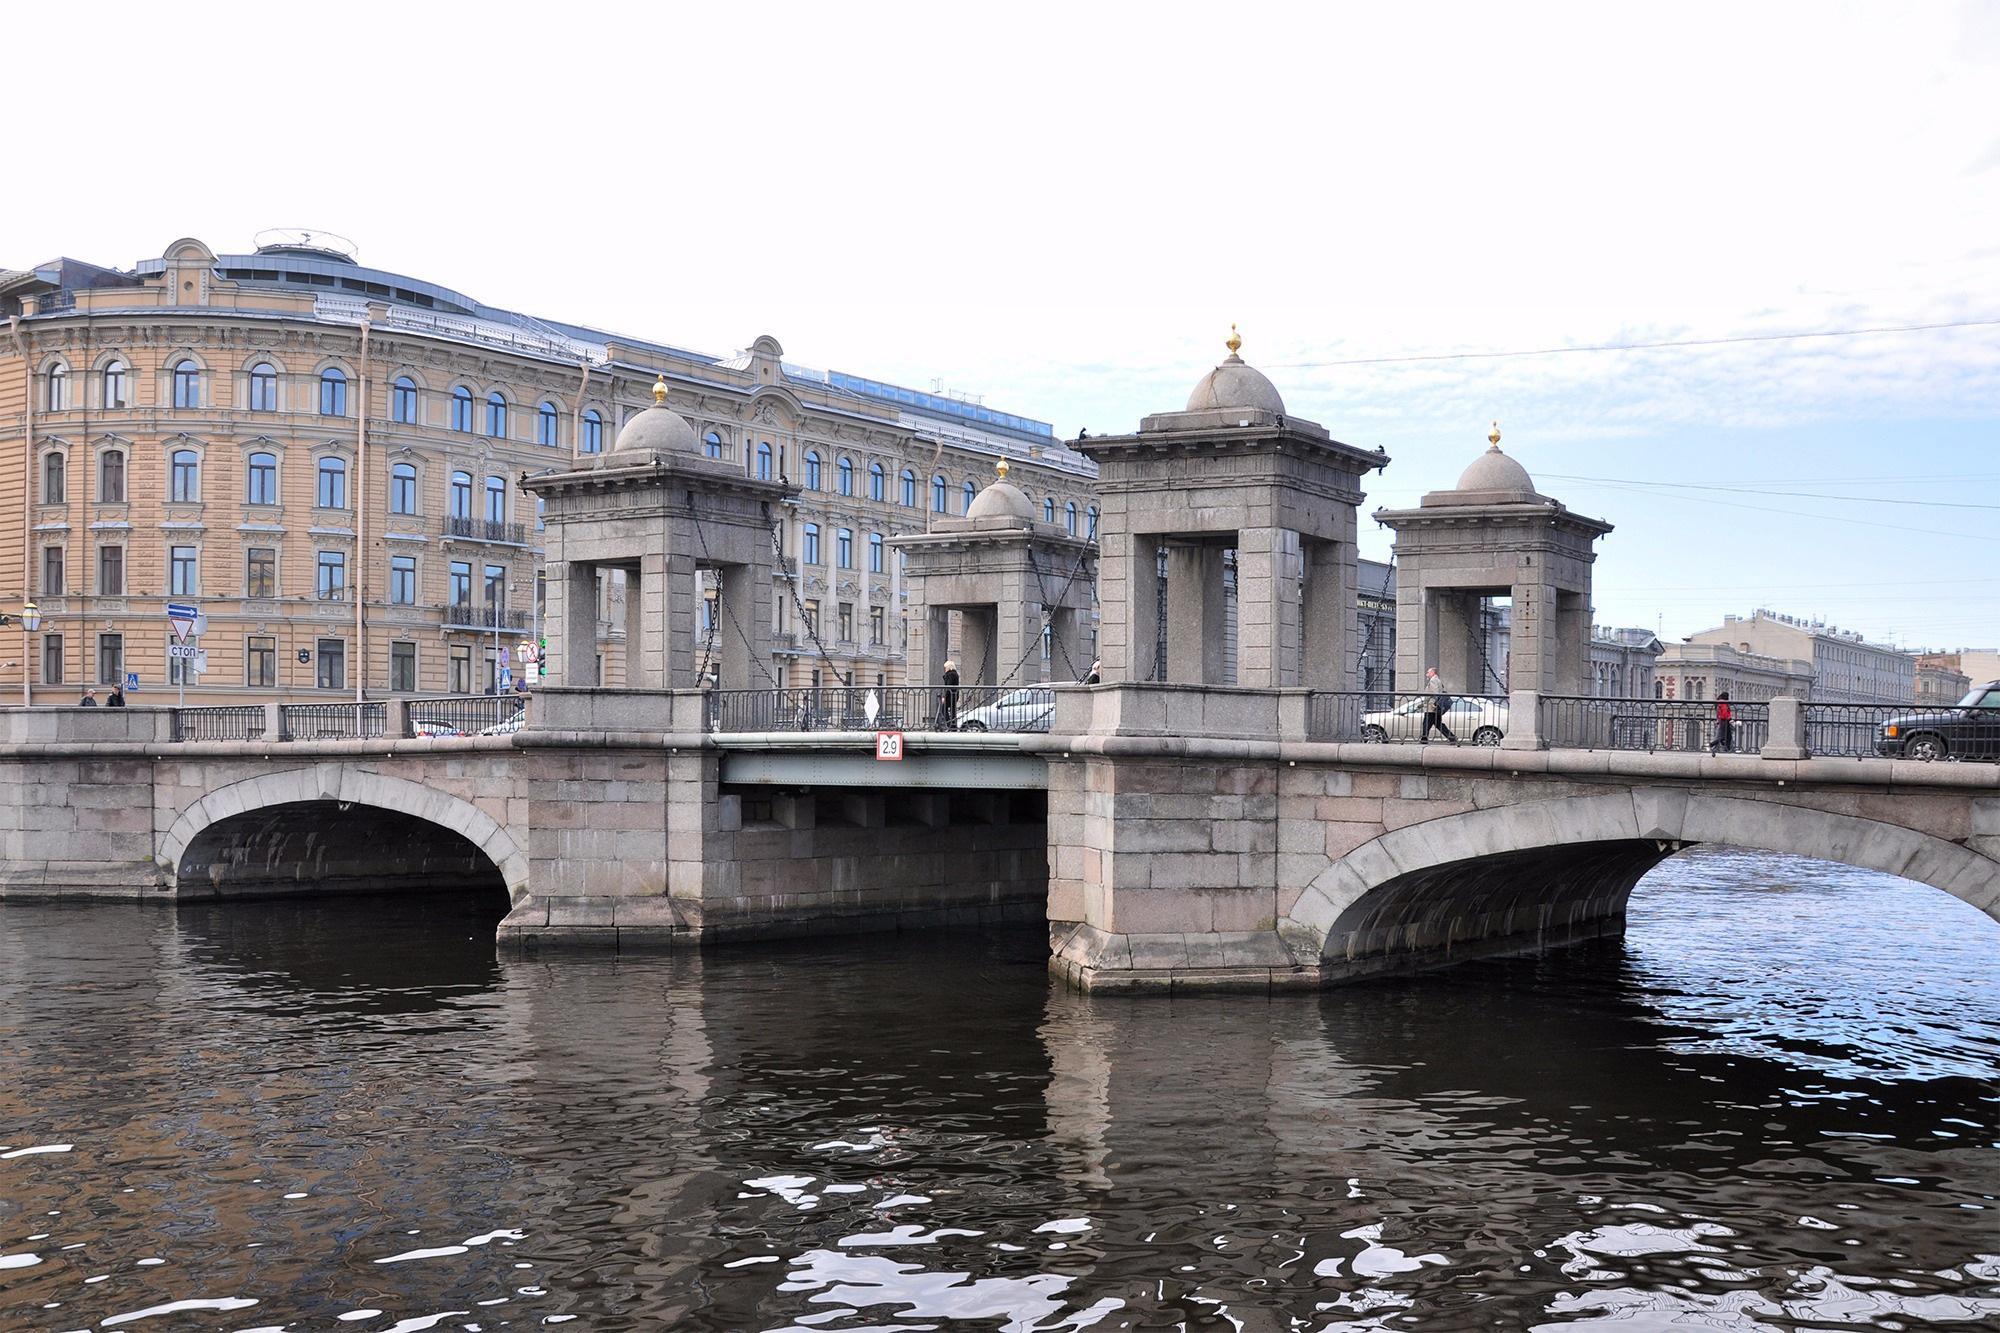 Мост Ломоносова, Санкт-Петербург, Россия